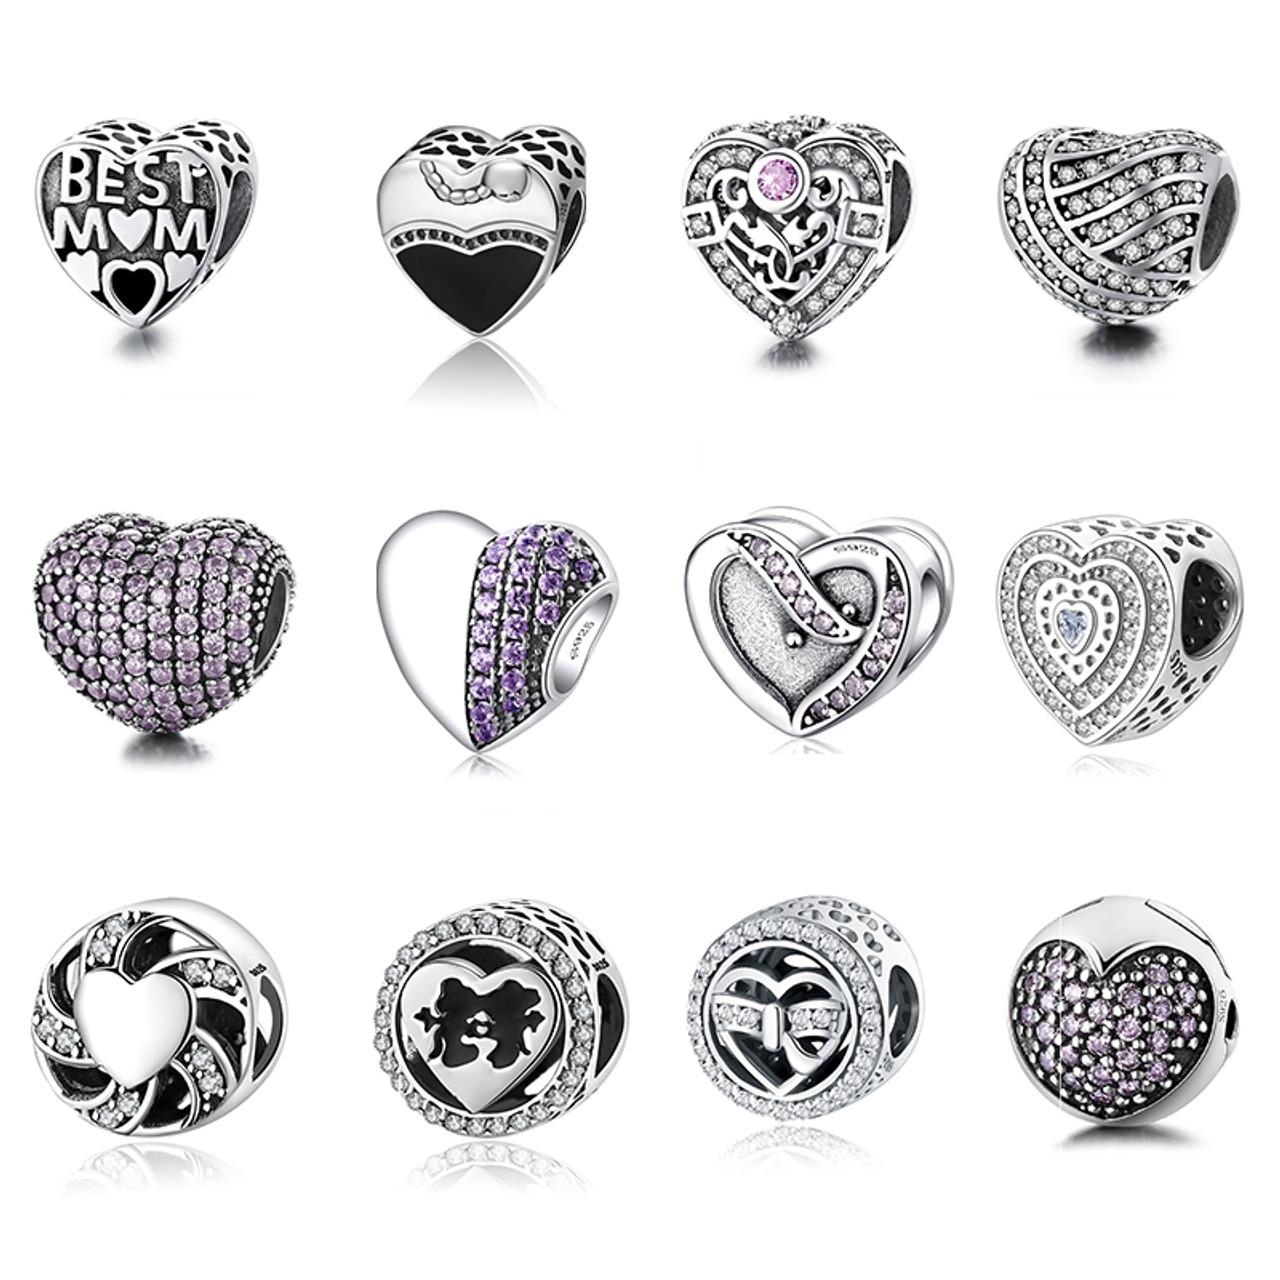 9d3febafb 12 Style Authentic 925 Sterling Silver Heart Shape Beads Charm Fit pandora  Charm Bracelet DIY Original ...